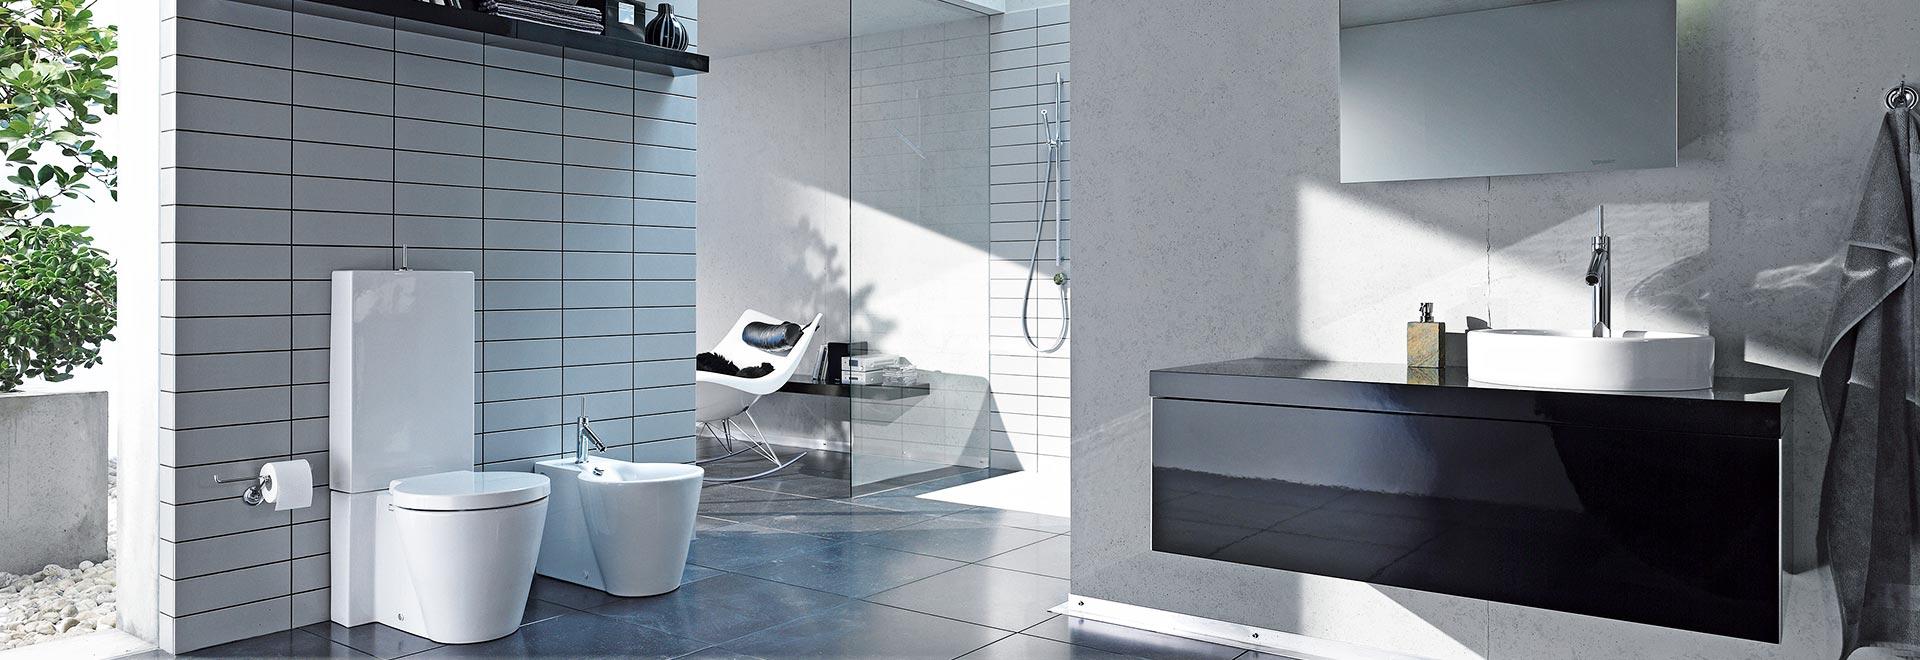 Walter Vögele GmbH in Freiburg: Moderne Badgestaltung